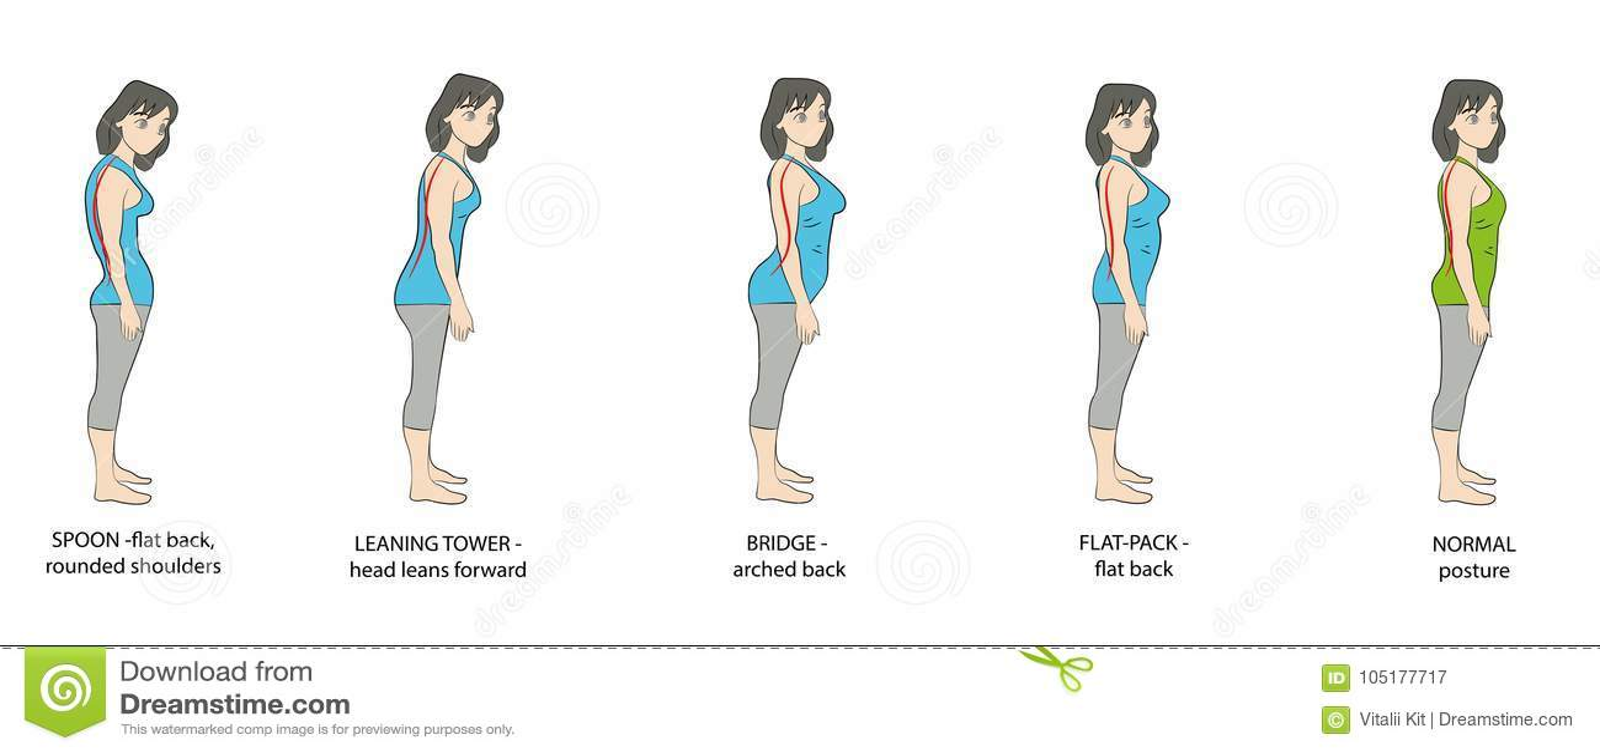 types of posture women  vector illustration  stock vector